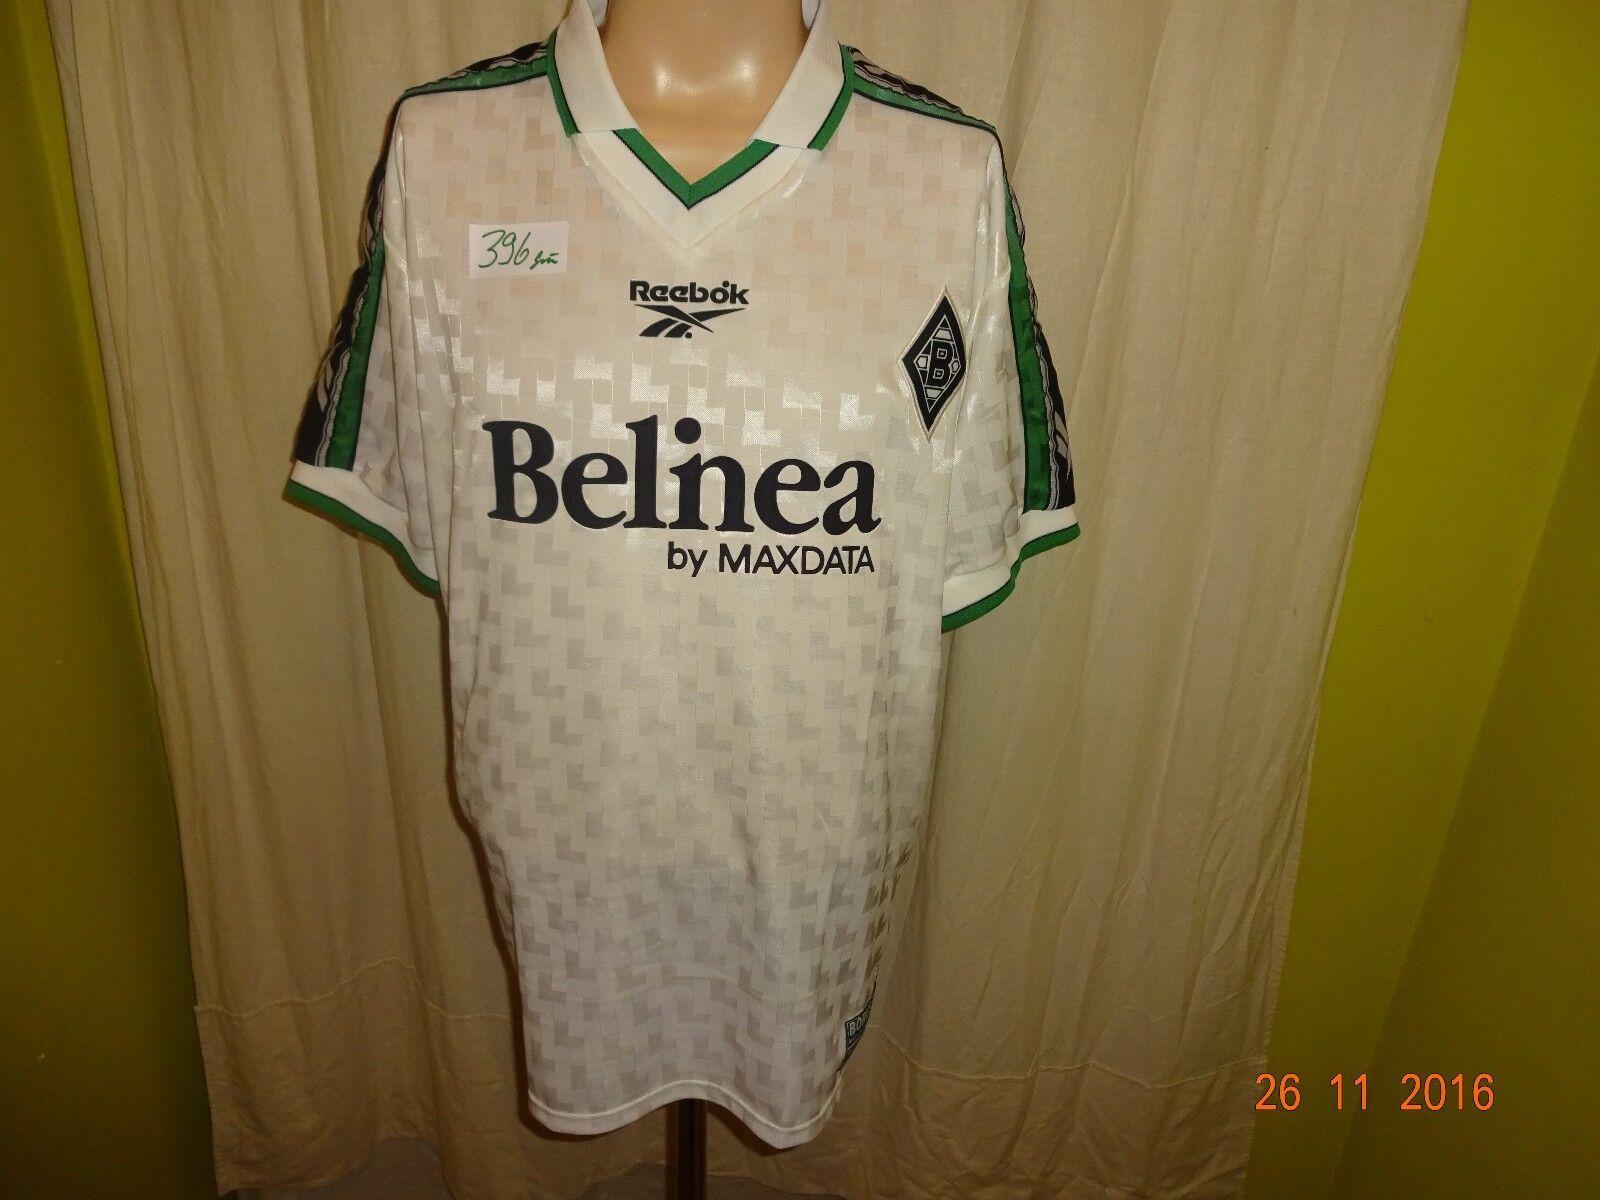 Borussia Mönchengladbach Reebok Reebok Reebok Limitiertes Trikot 1998 99  Belinea  Gr.L TOP 1f43b0